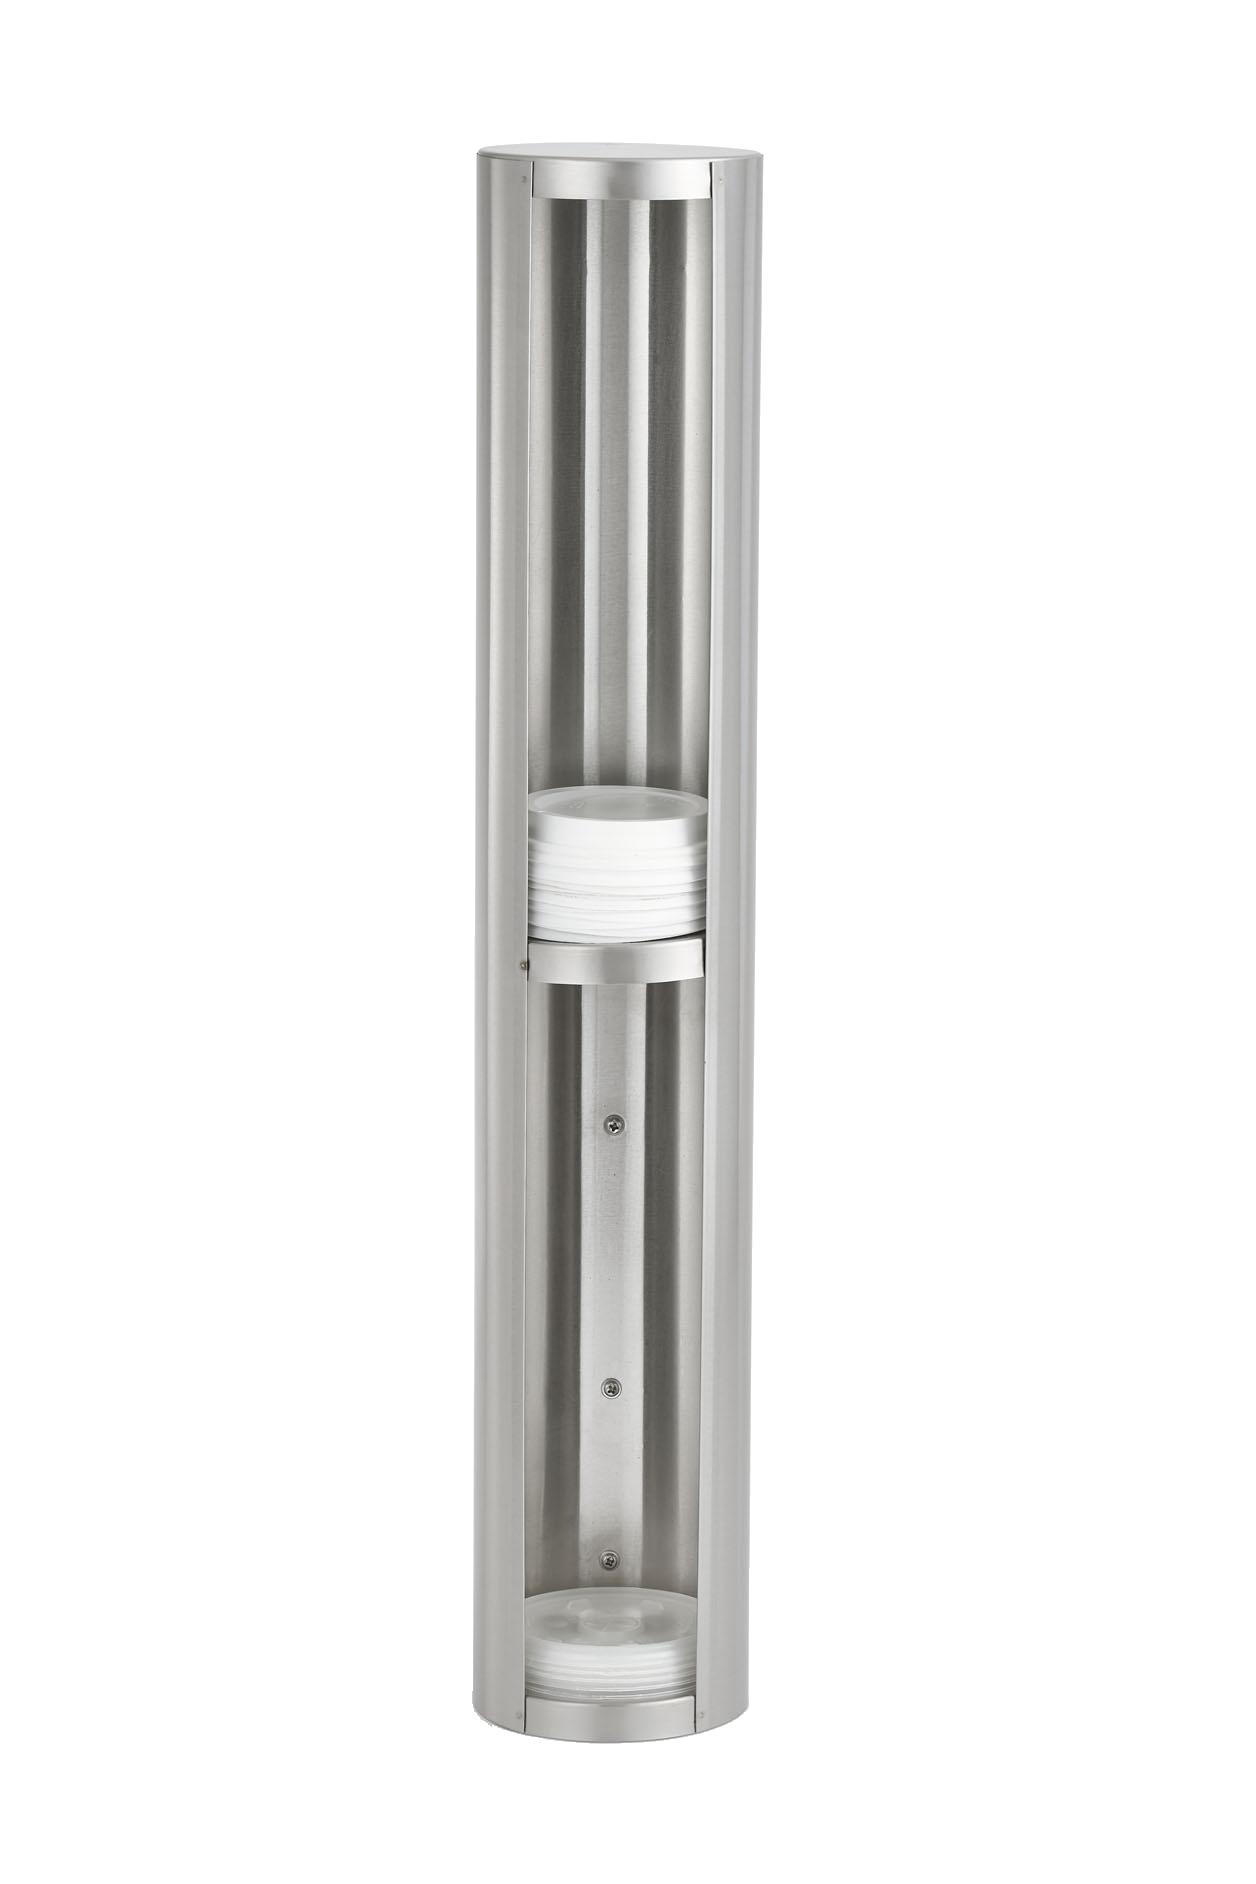 Vollrath LD2-2 lid dispenser, wall mount